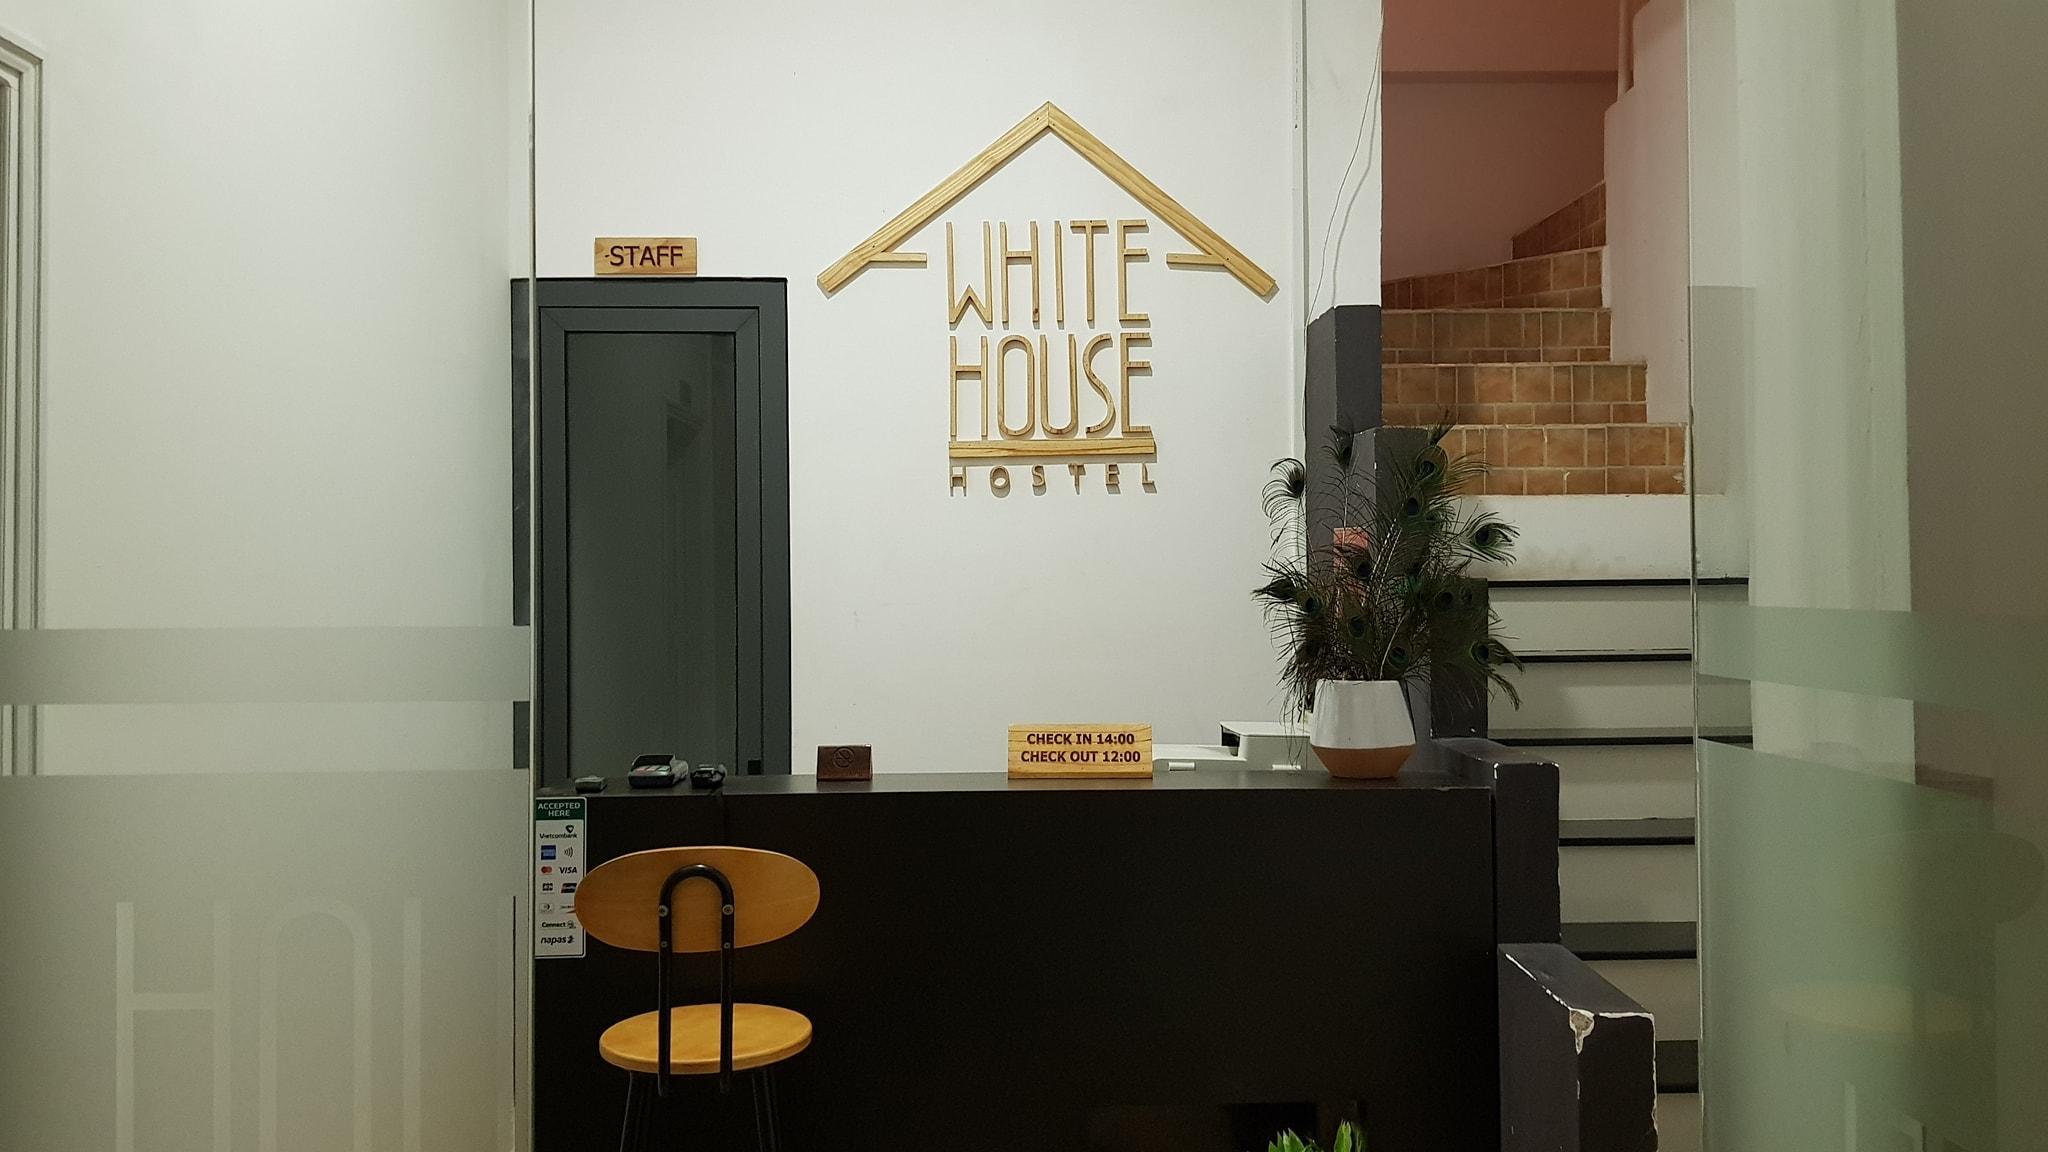 White House Hostel